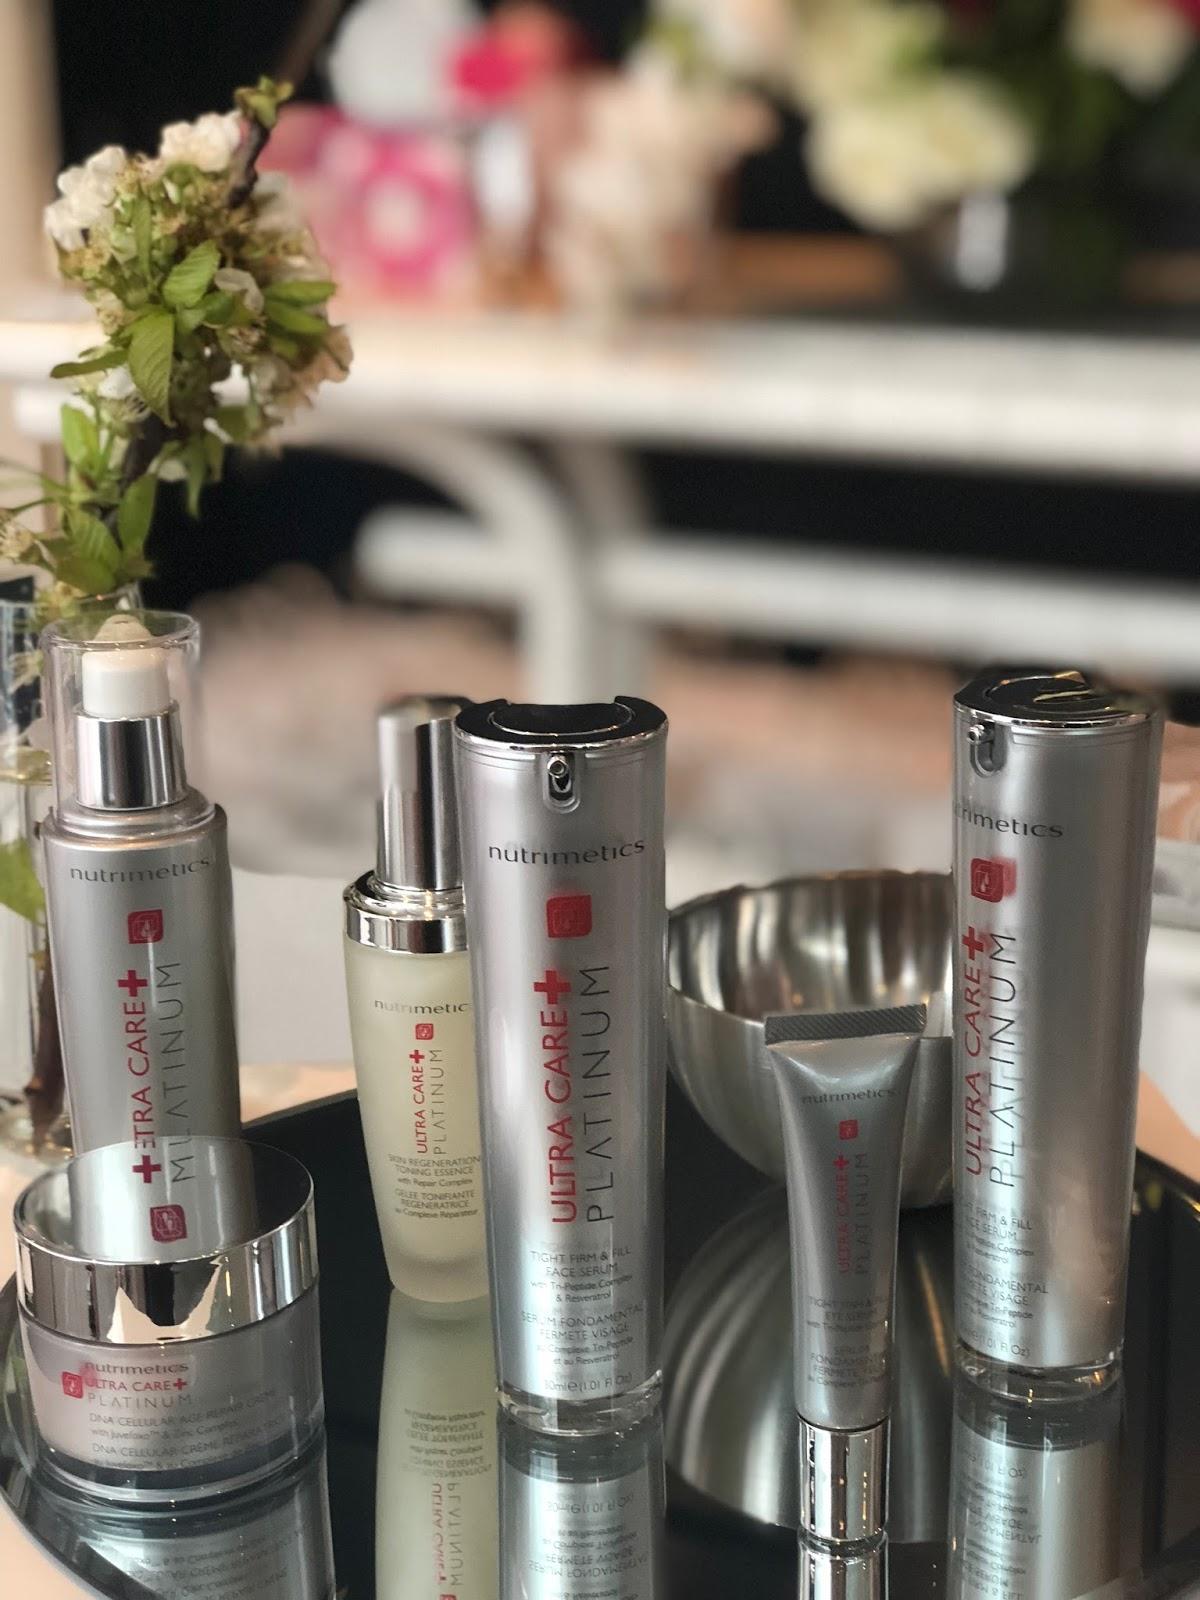 Beautyheaven 10th Birthday Nutrimetics